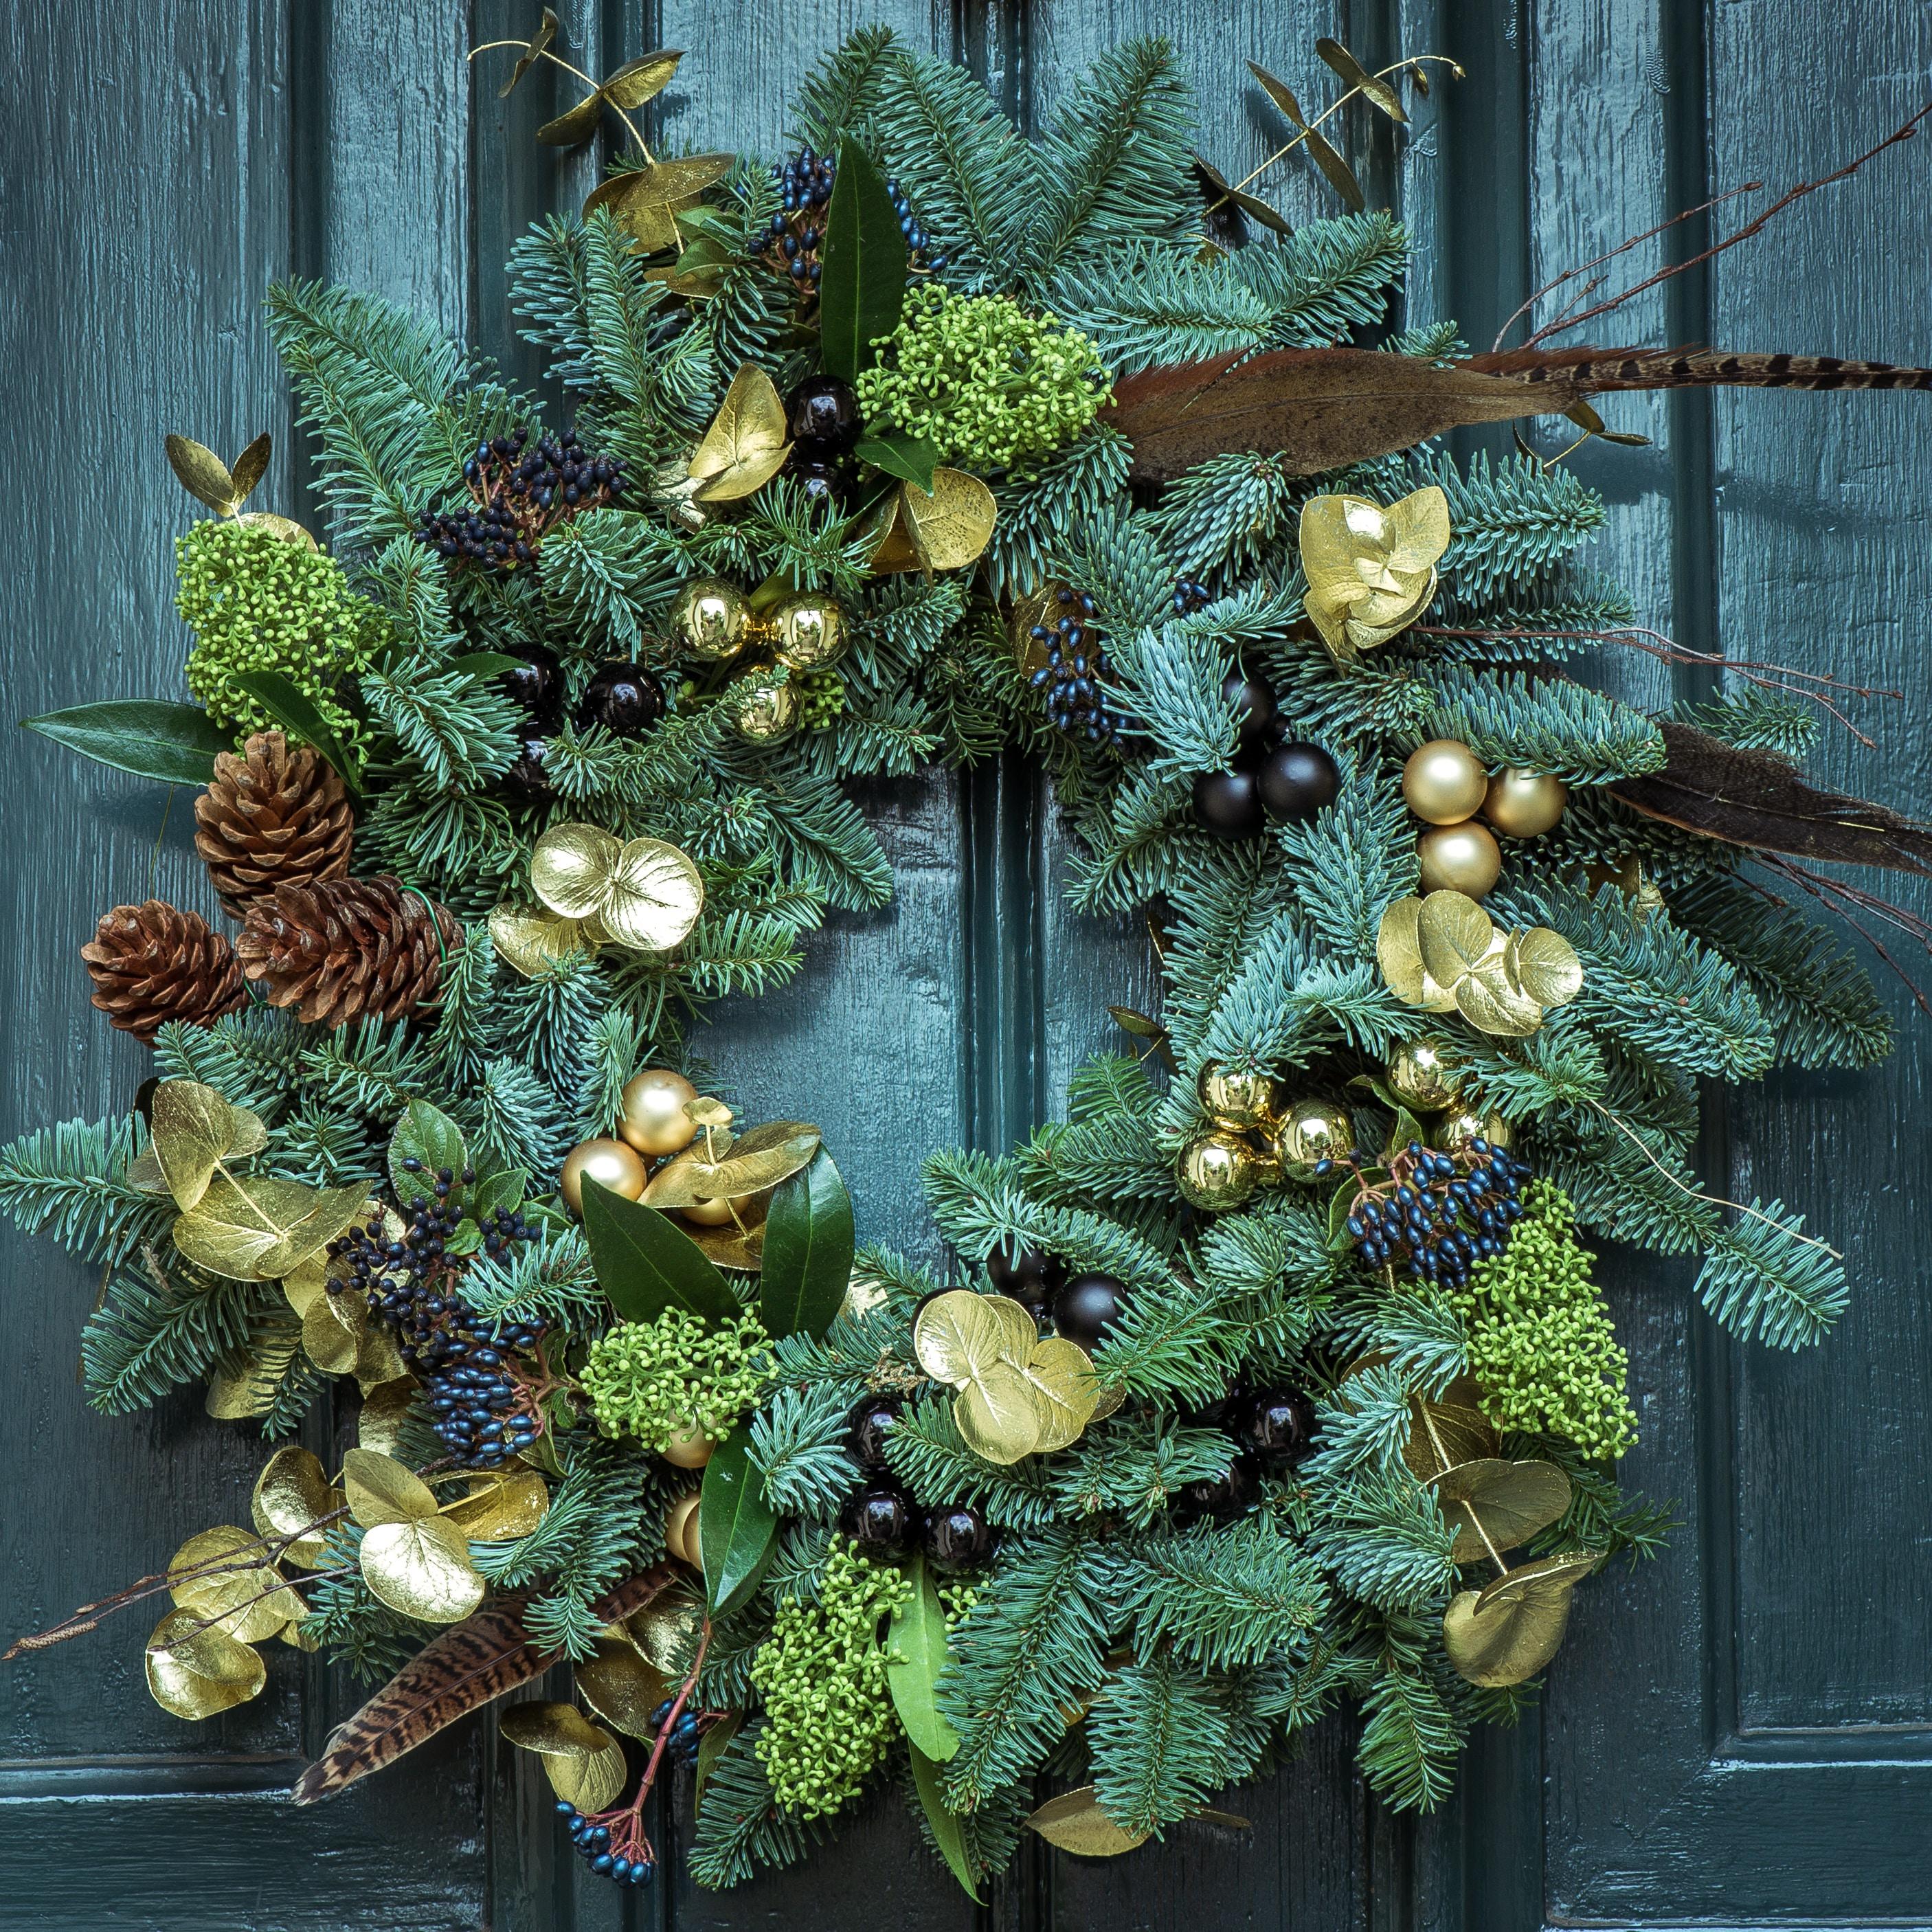 17 Christmas Garden Ideas: Festive And Organic Holiday Decorations